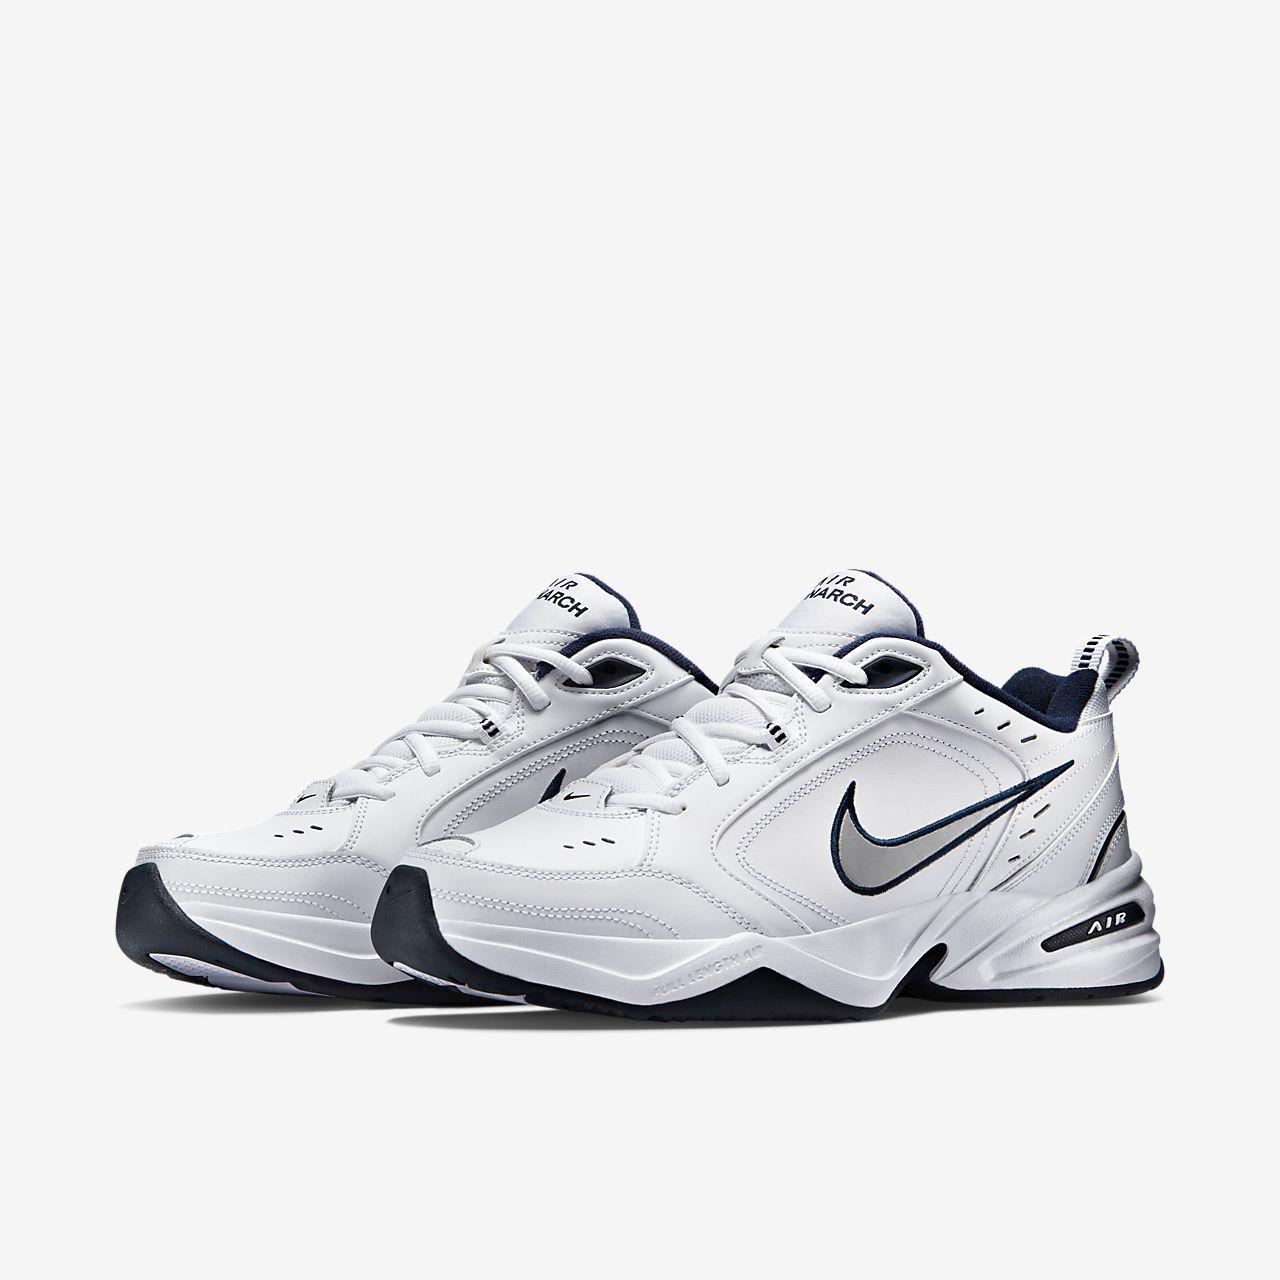 sports shoes b2c9b 34a6e Nike Air Monarch IV-unisex-træningssko